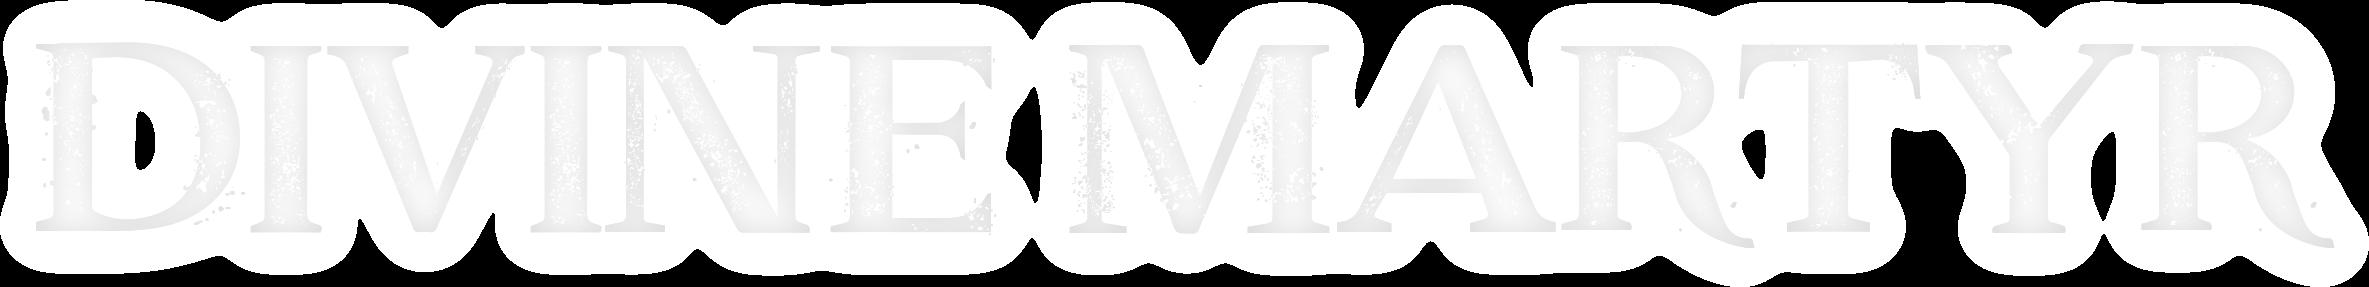 Dust Serif font (white glow).png